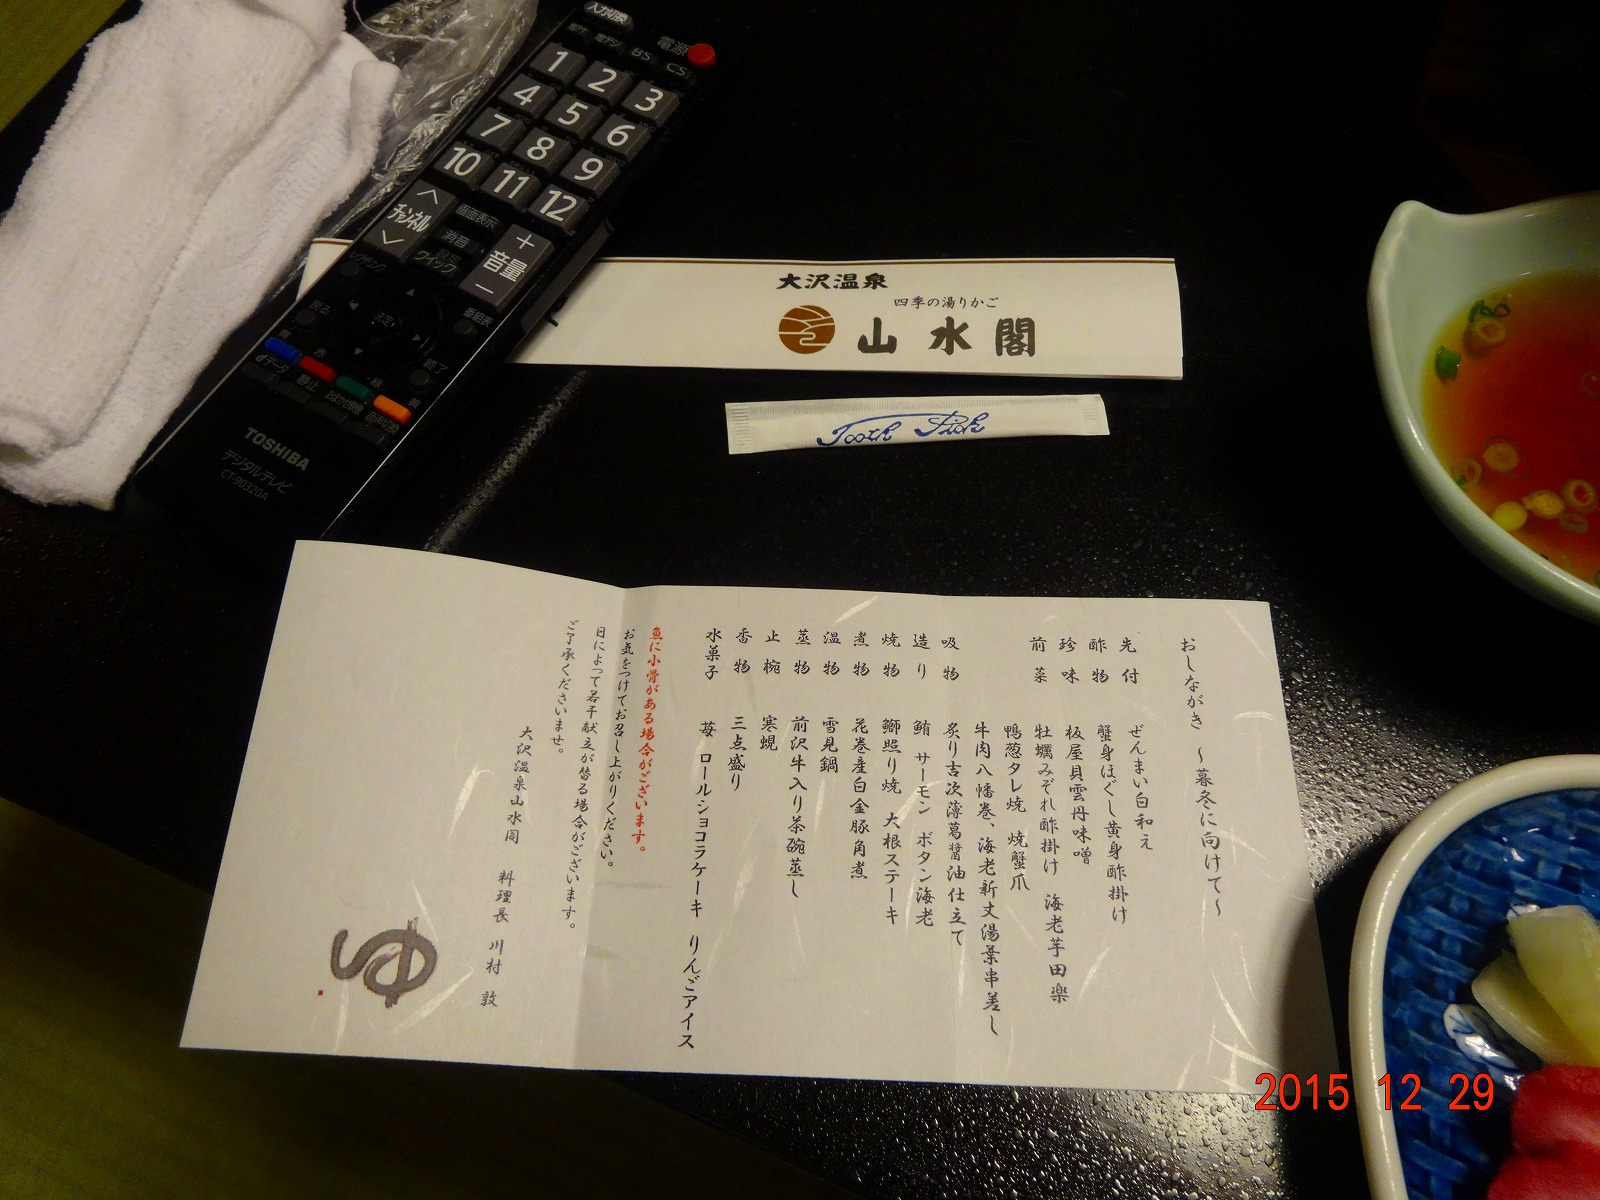 http://mafutan.com/marutanikki/2015/12/31/oosawa%20%2810%29.jpg